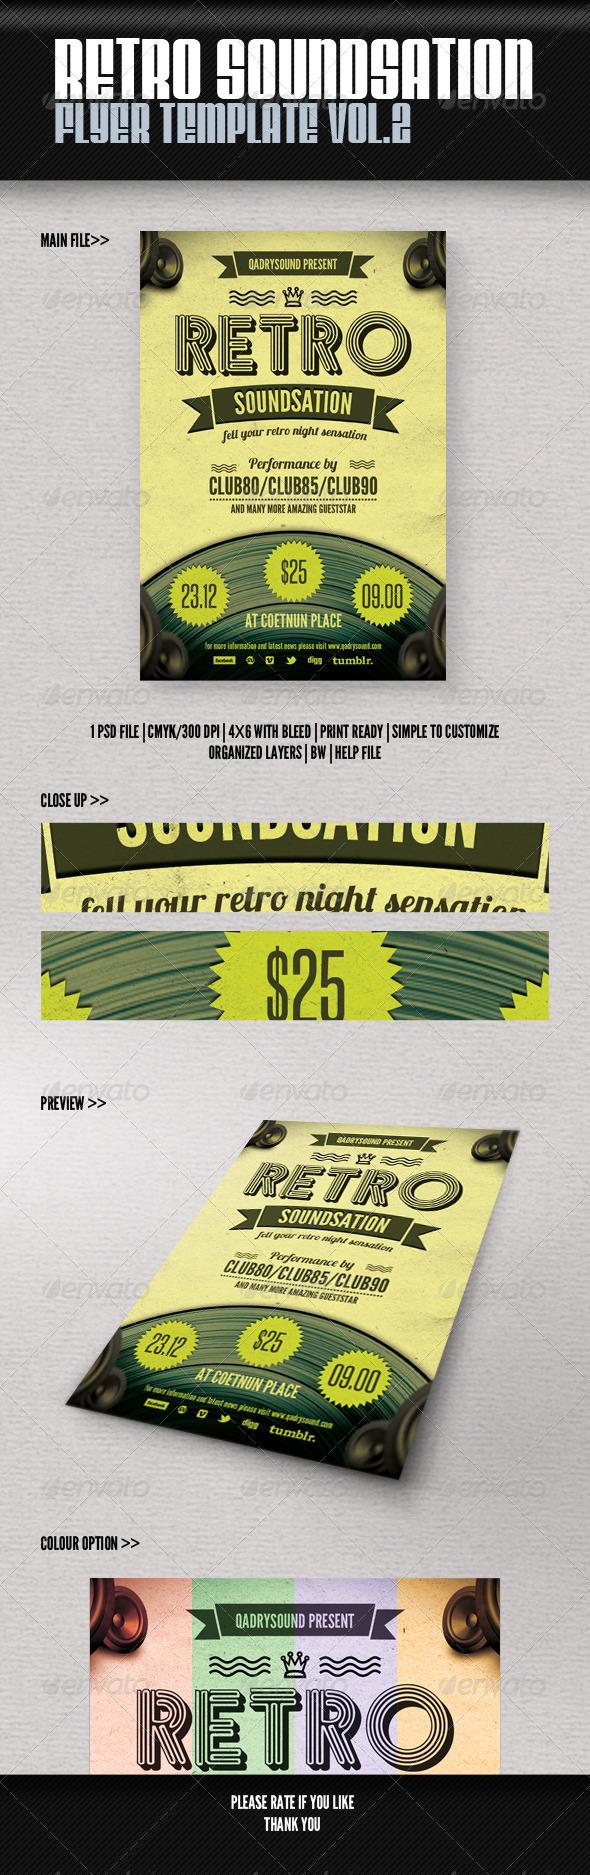 Retro Soundsation Flyer Vol. 2 - Retro/Vintage Business Cards